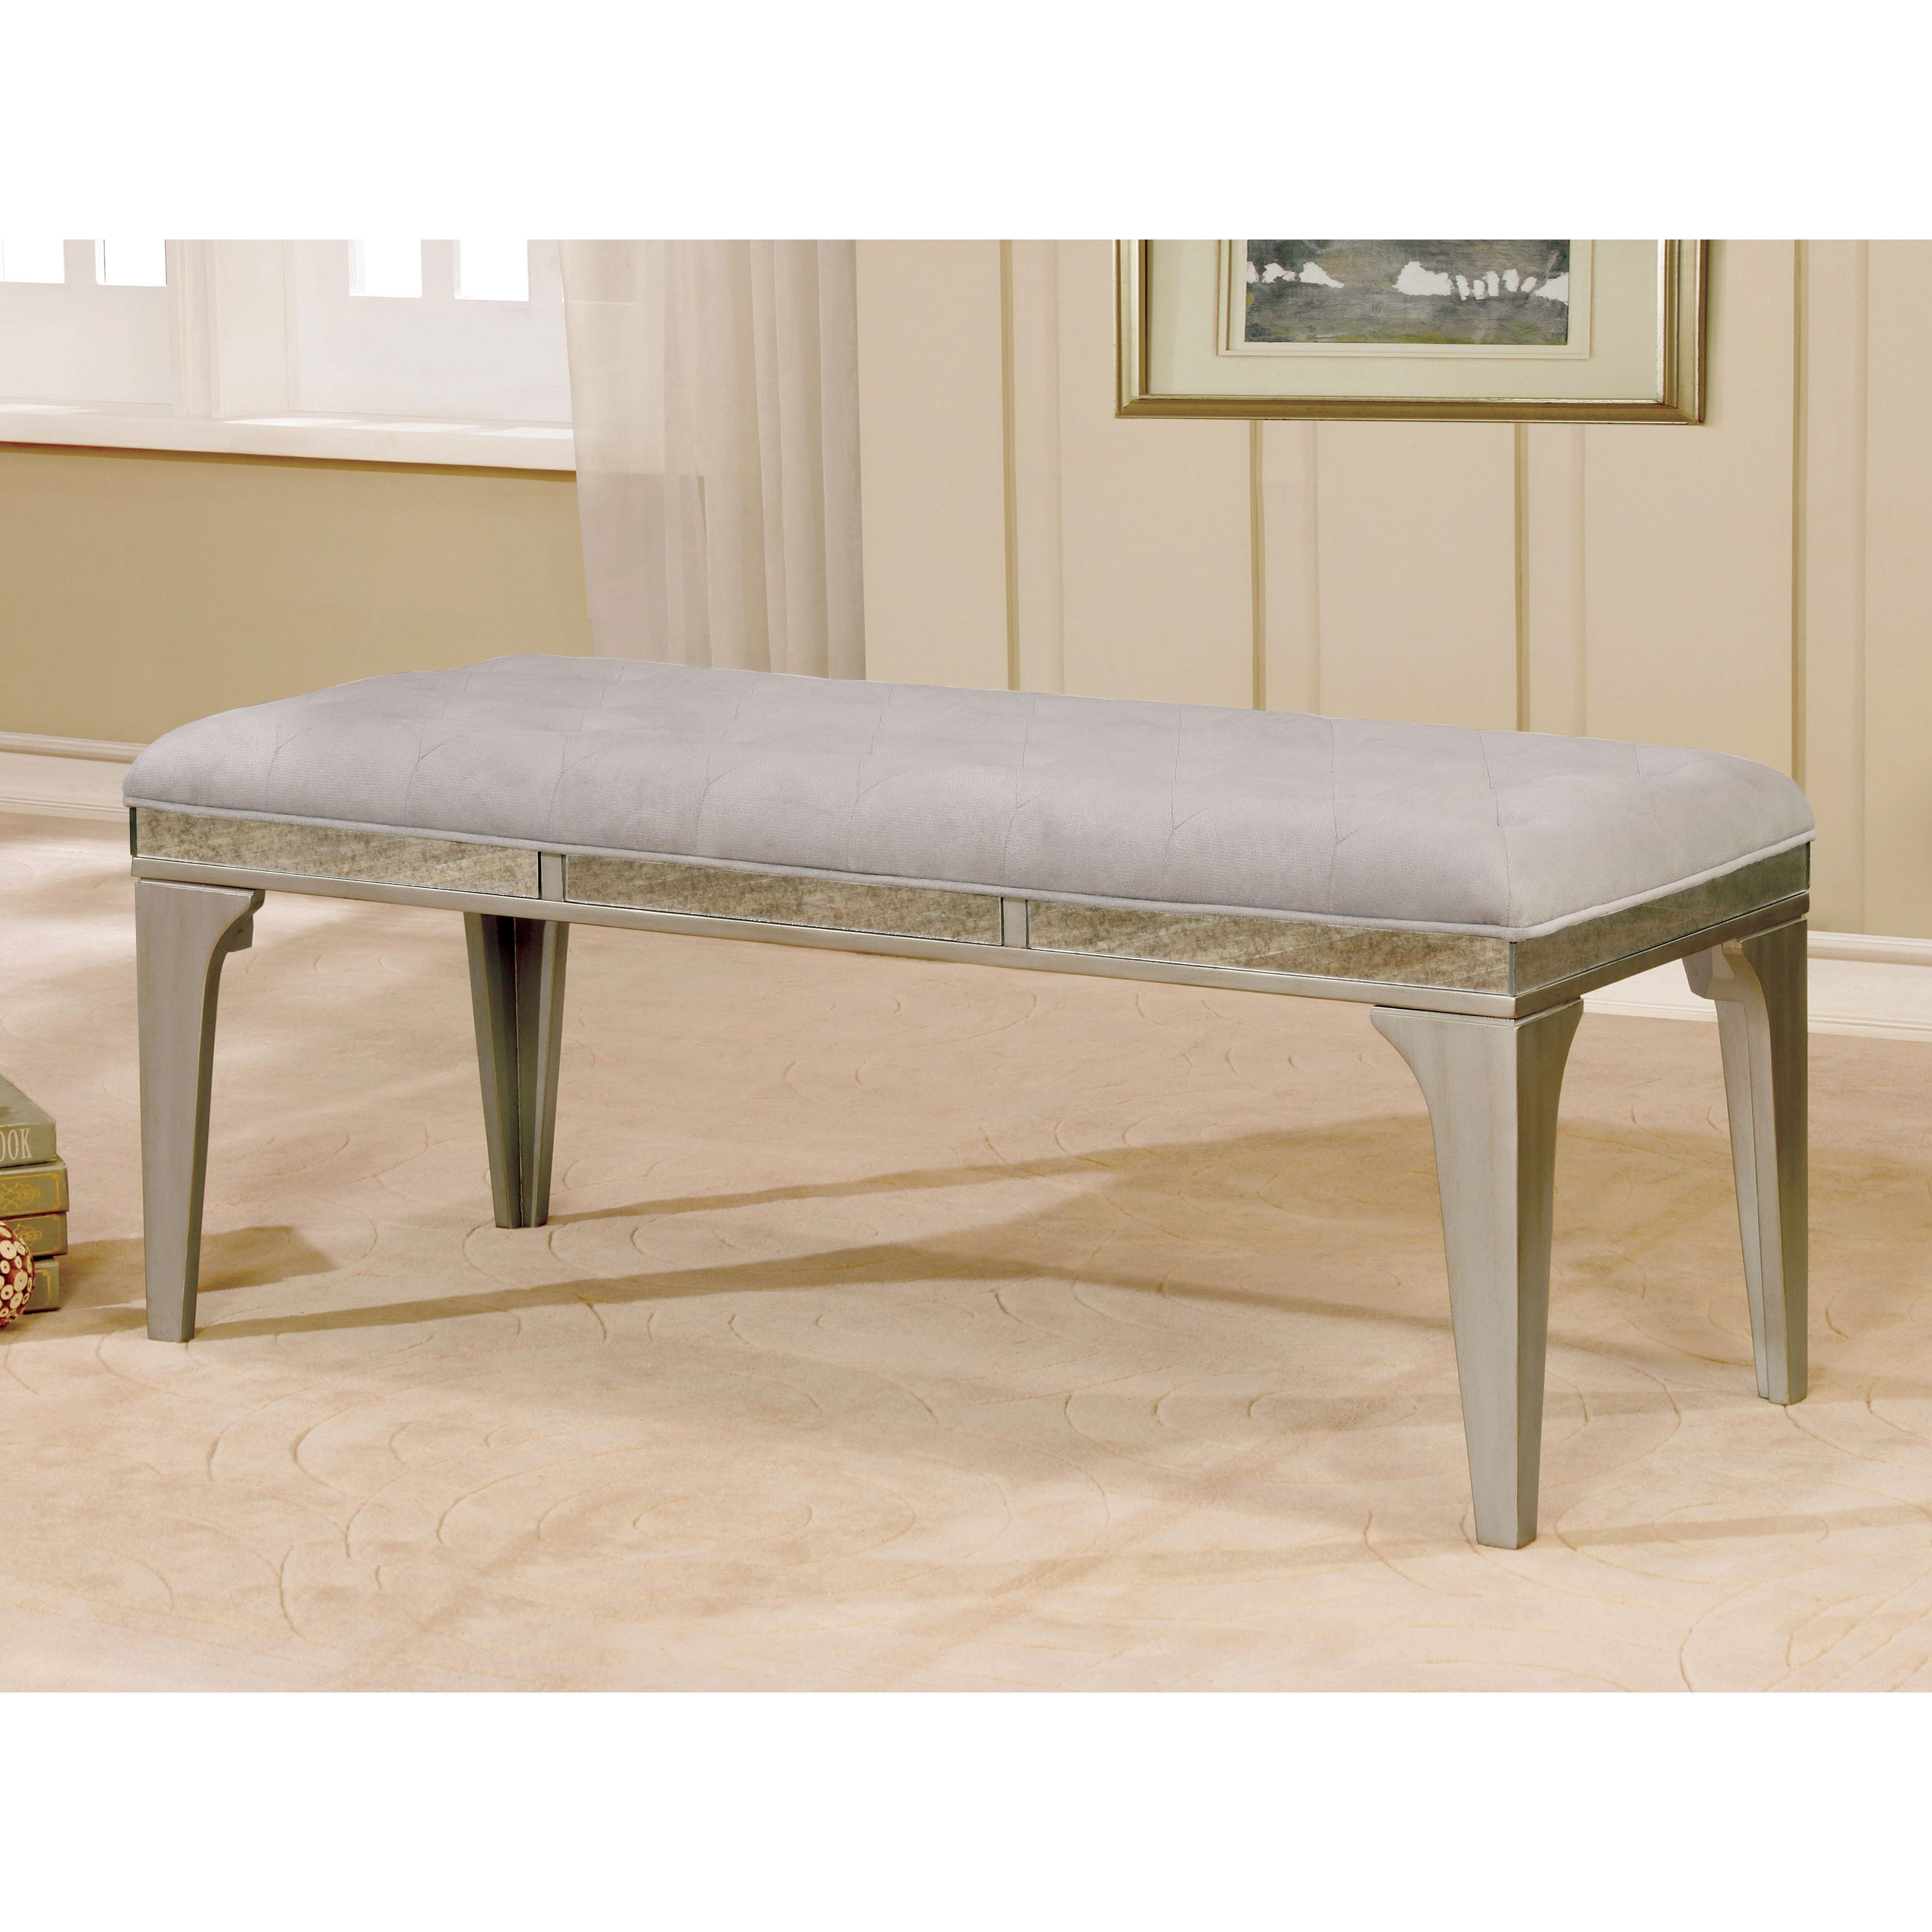 Shop Furniture Of America Selano Contemporary Tufted Flannelette